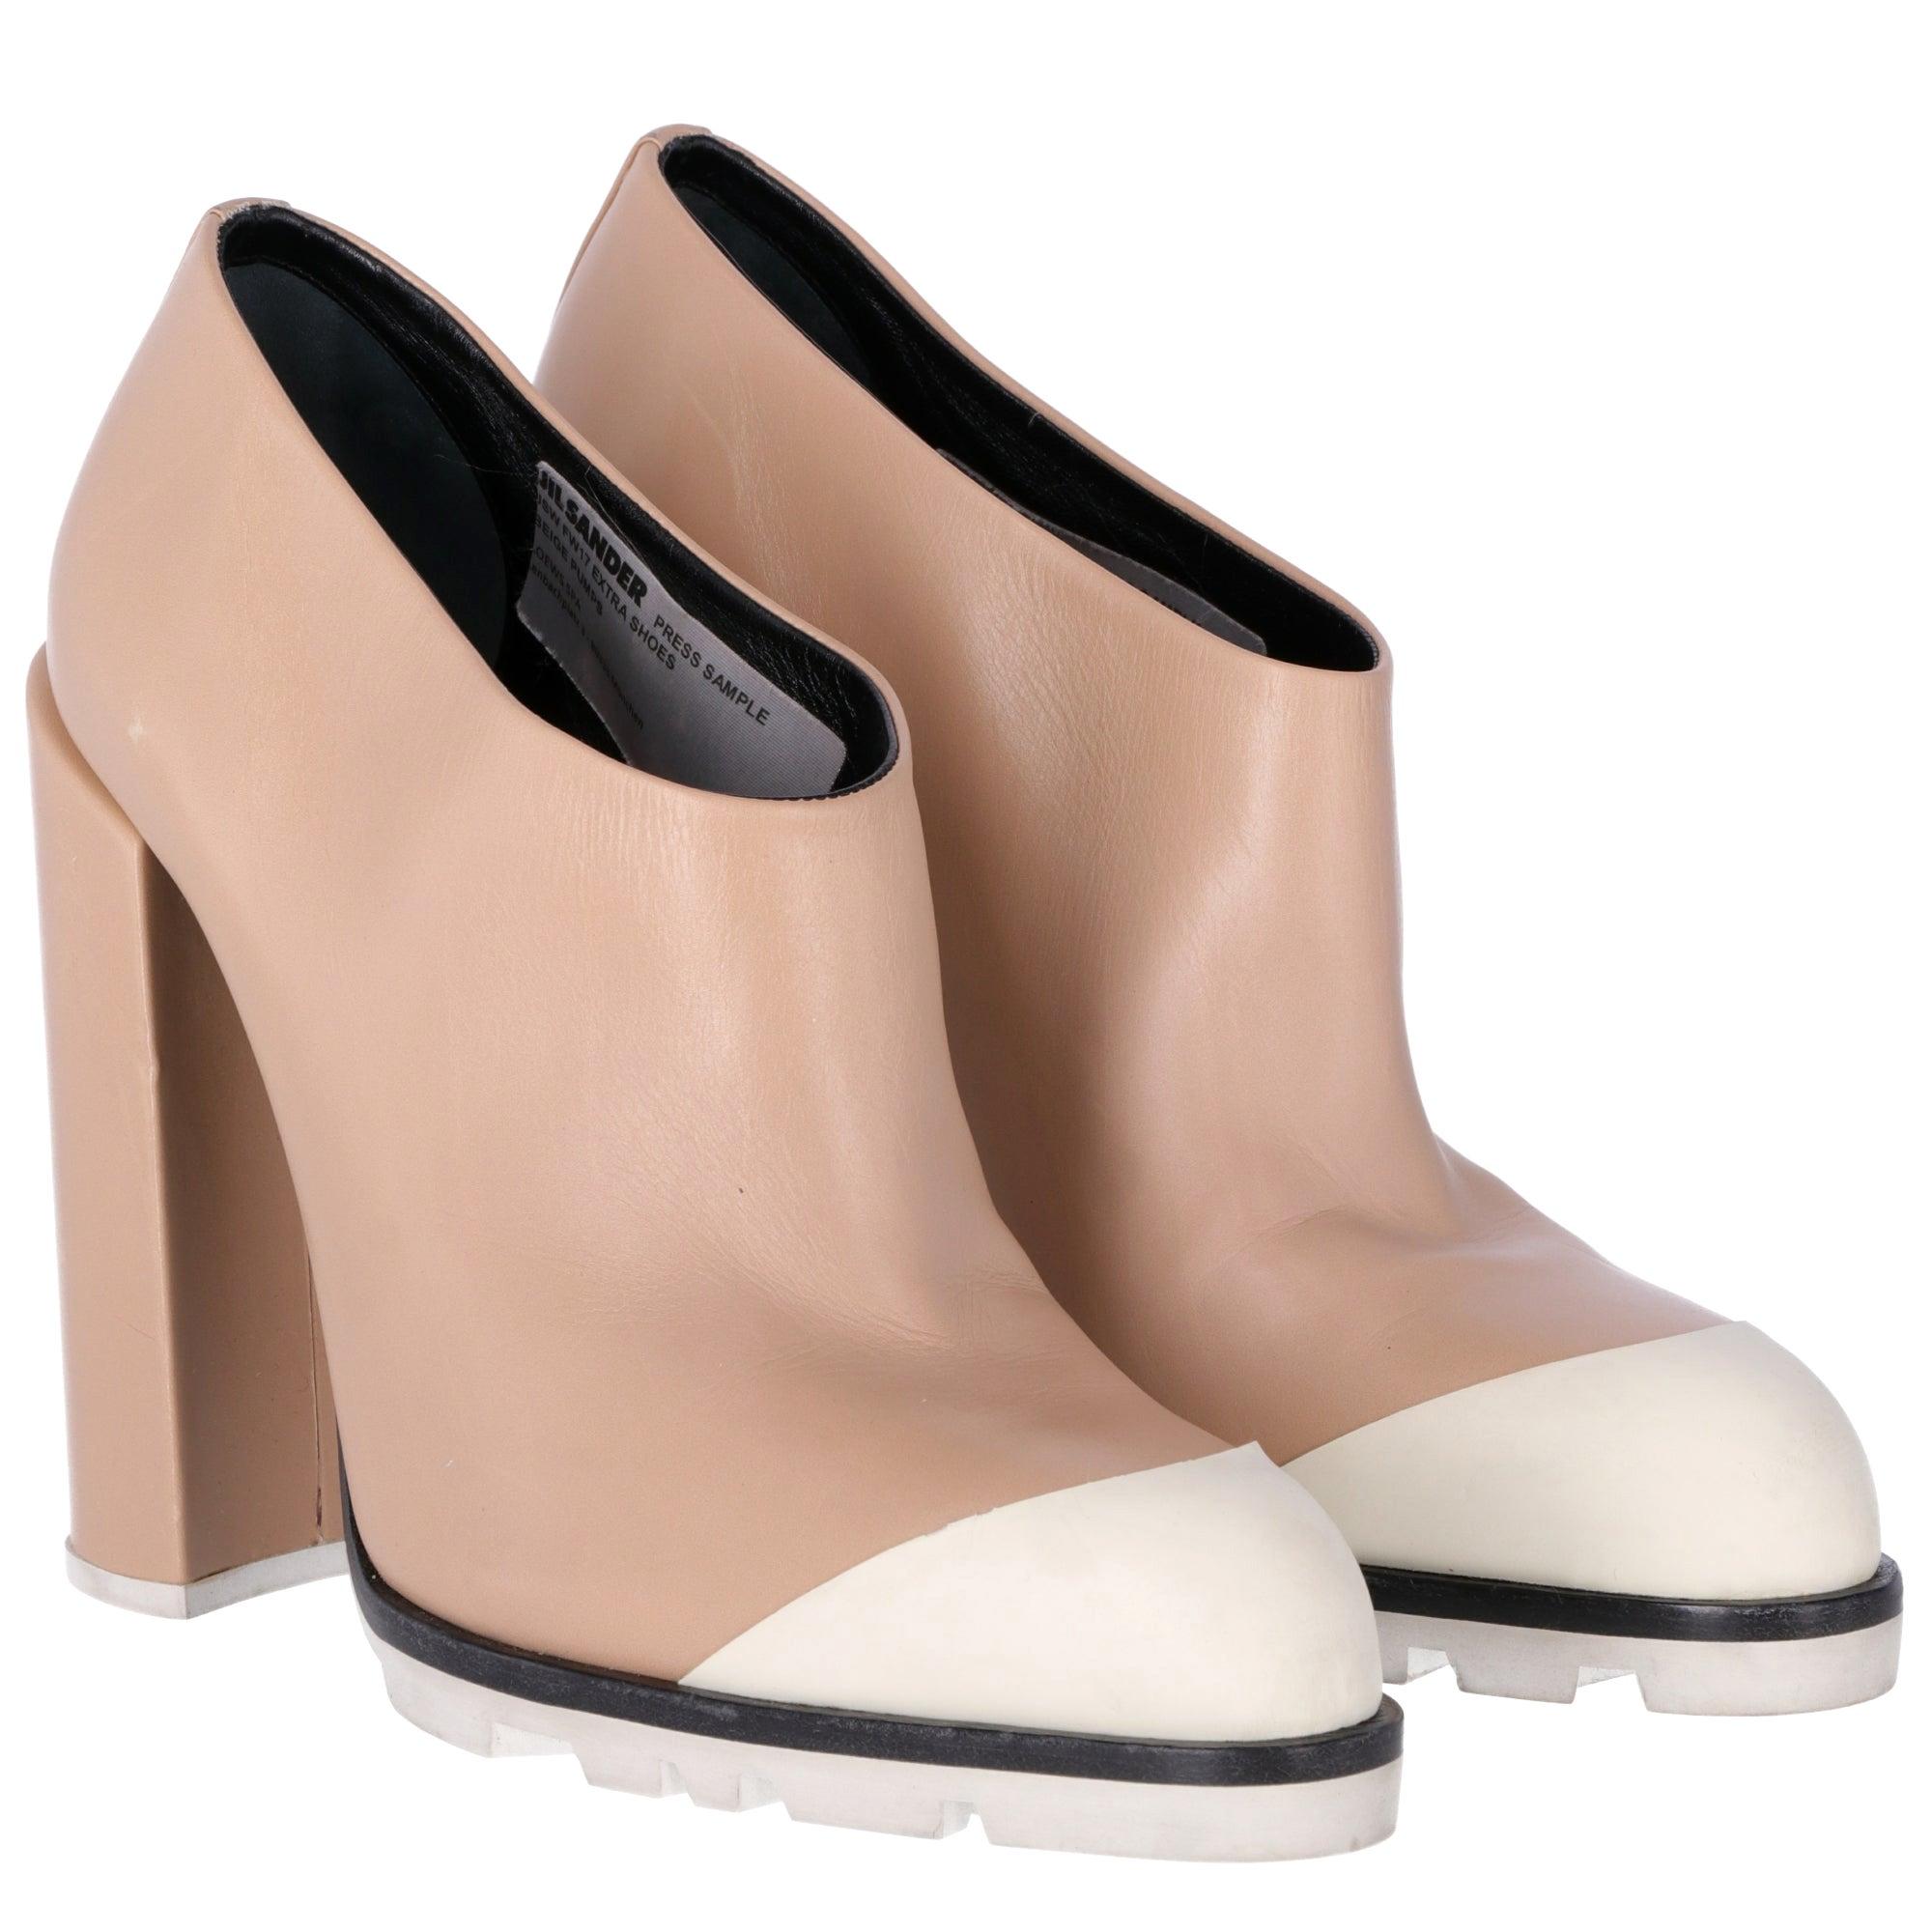 2010s Jil Sander Beige Leather Ankle Boots